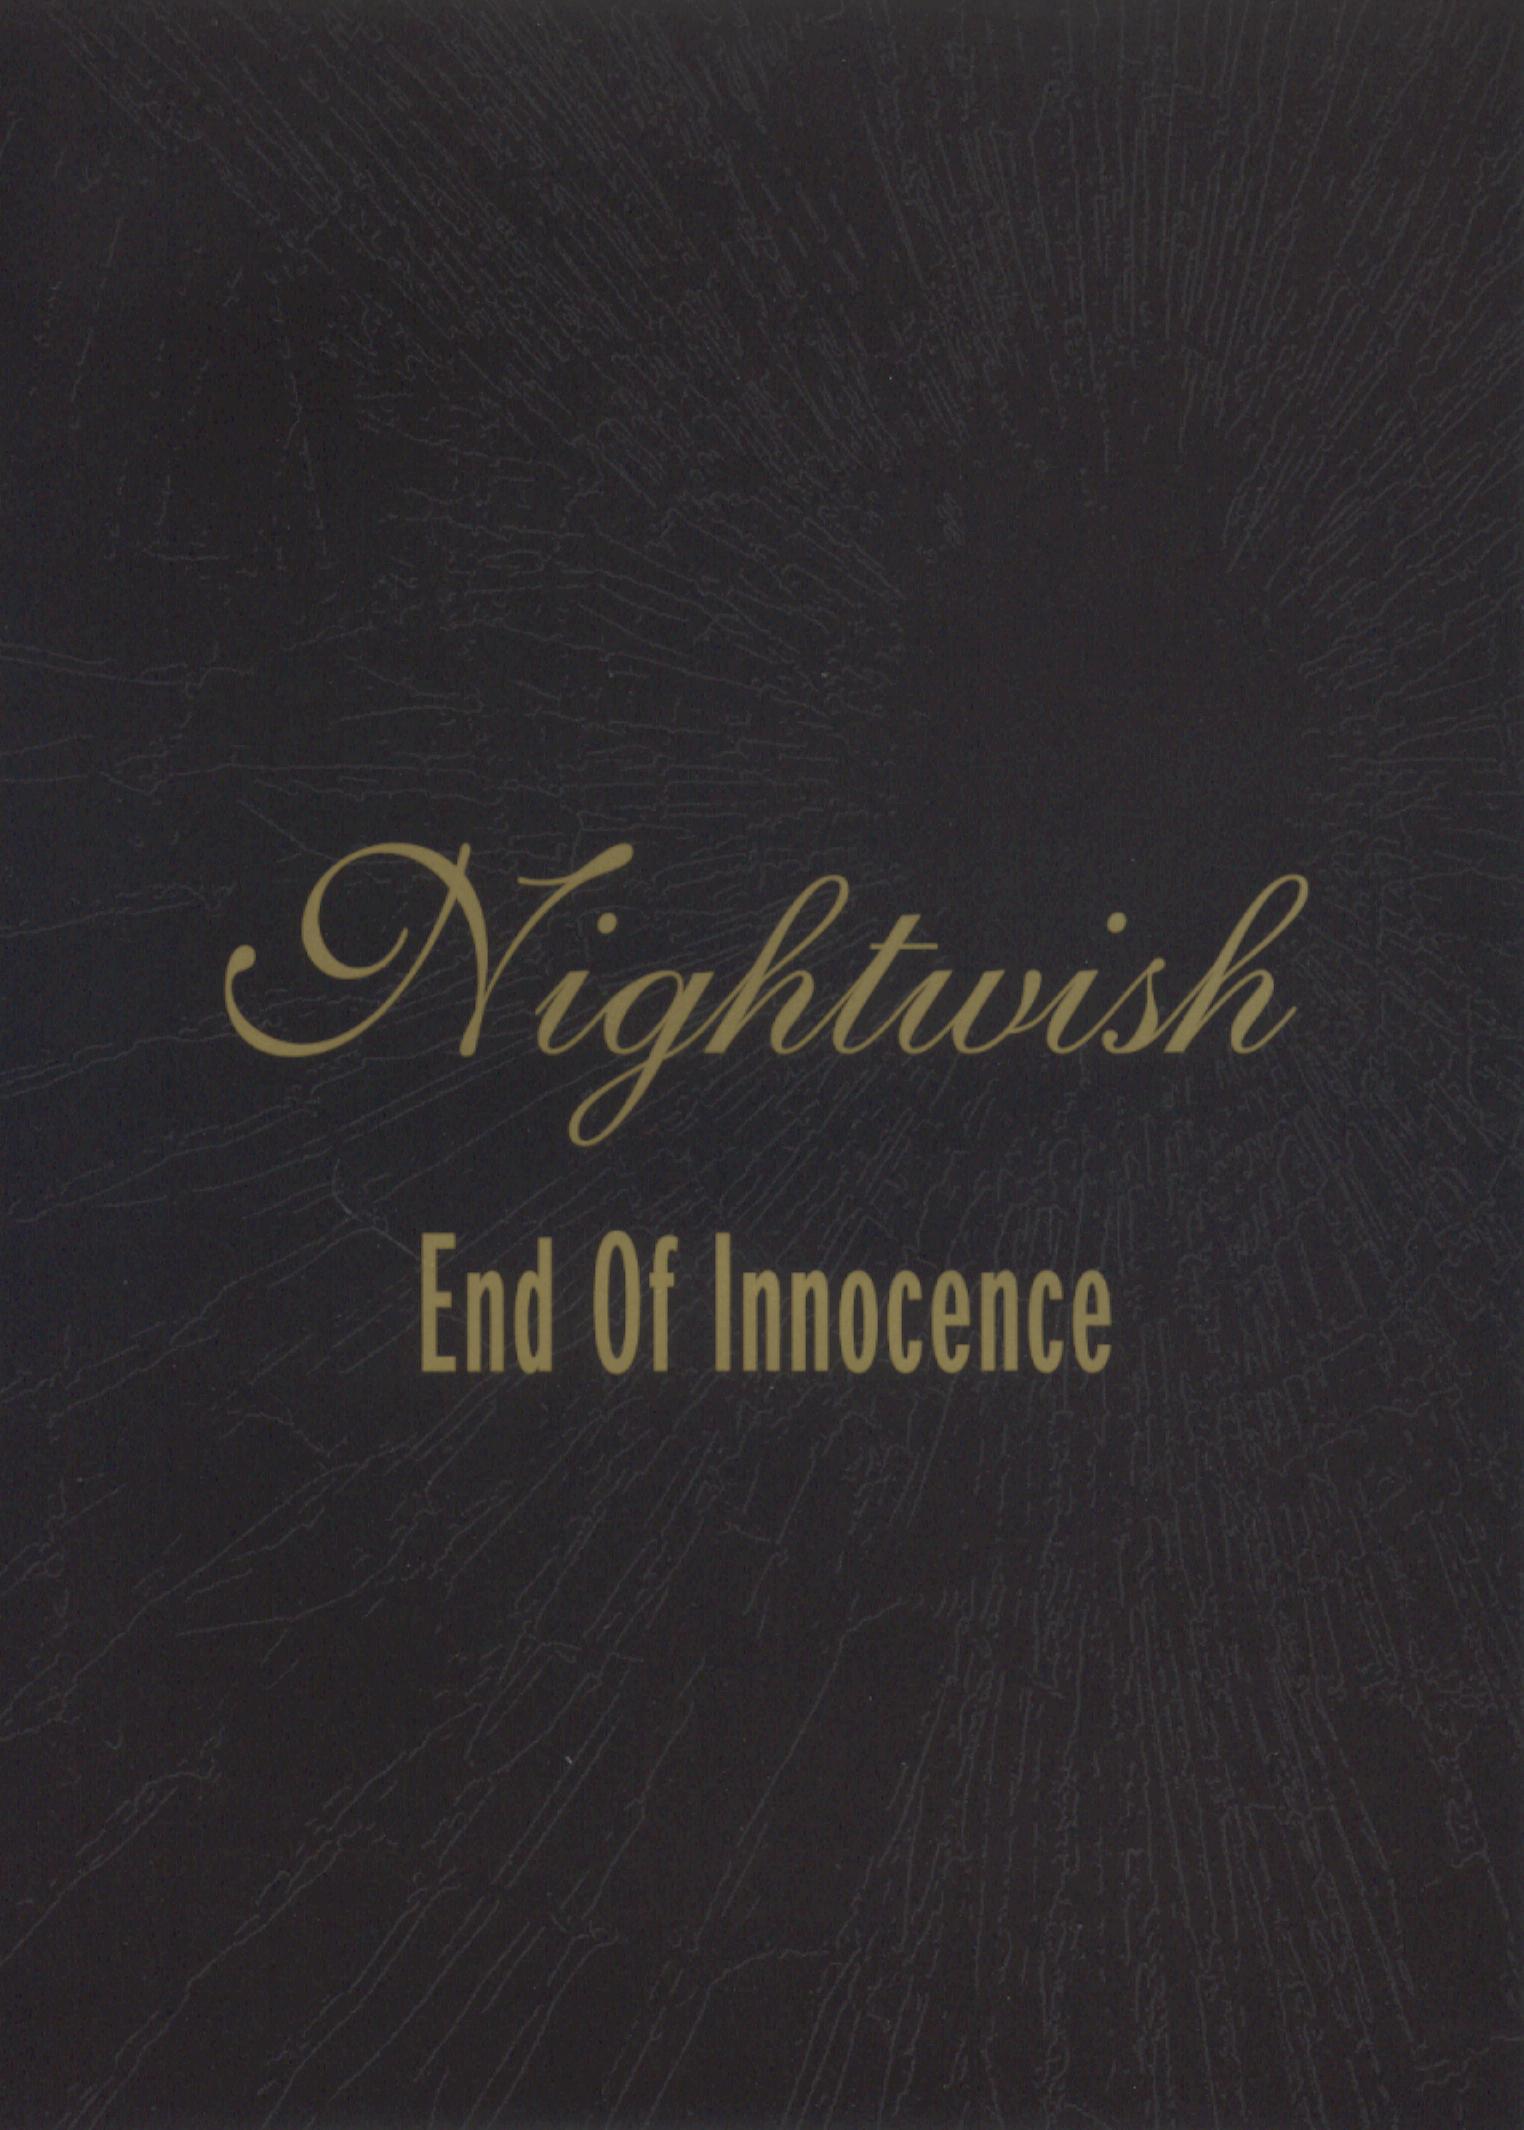 Nightwish: End of Innocence